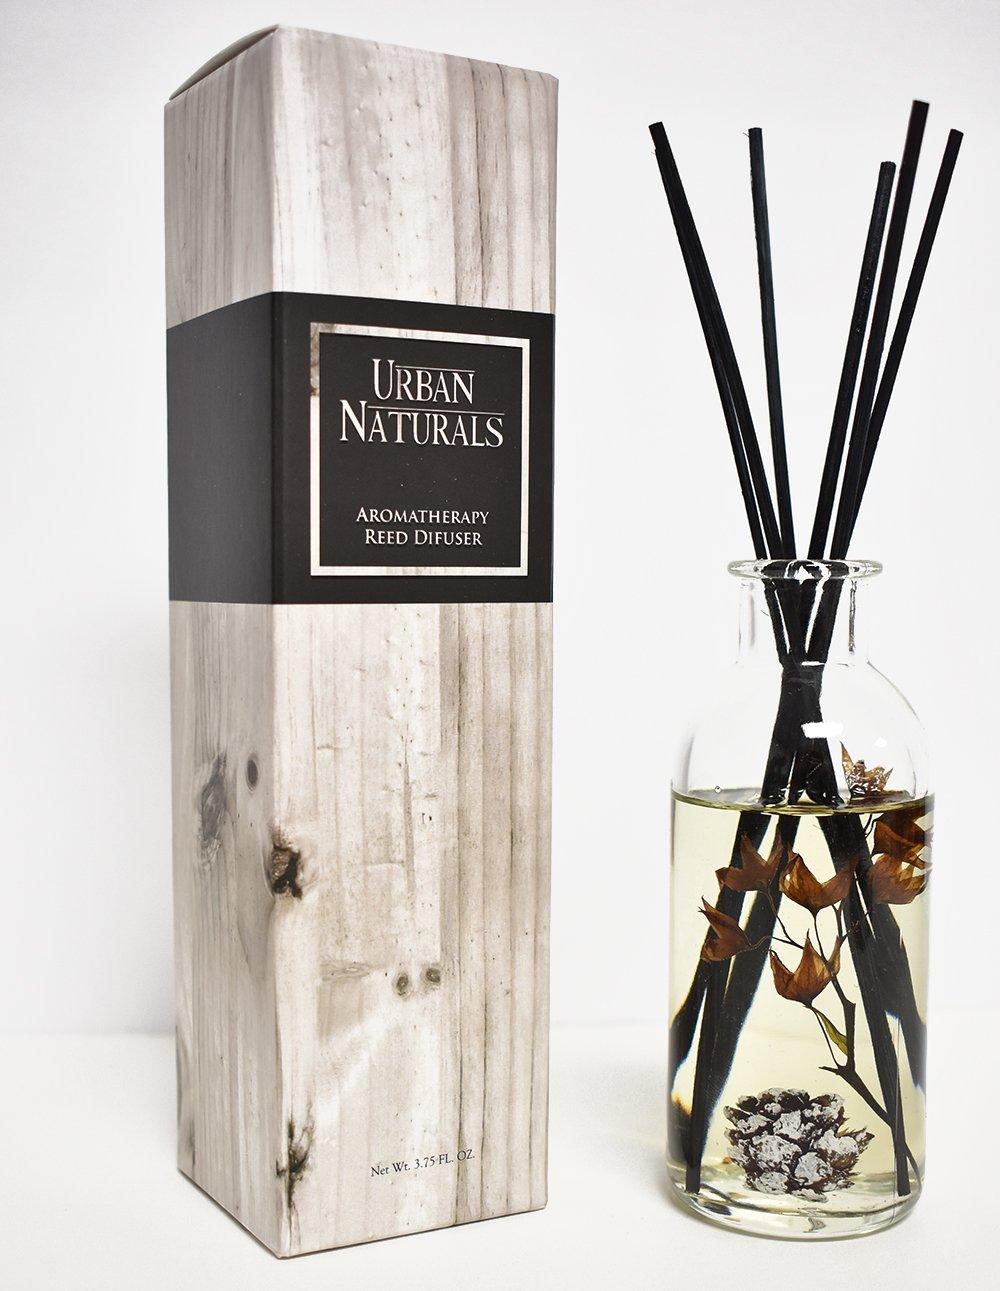 Urban Naturals Mountain Air Scented Fragrance Oil Reed Diffuser & Room Freshener | Golden Apples, Birch Wood Cashmere, Fennel & Cedar | Decorative Botanicals | Vegan | by Urban Naturals (Image #3)